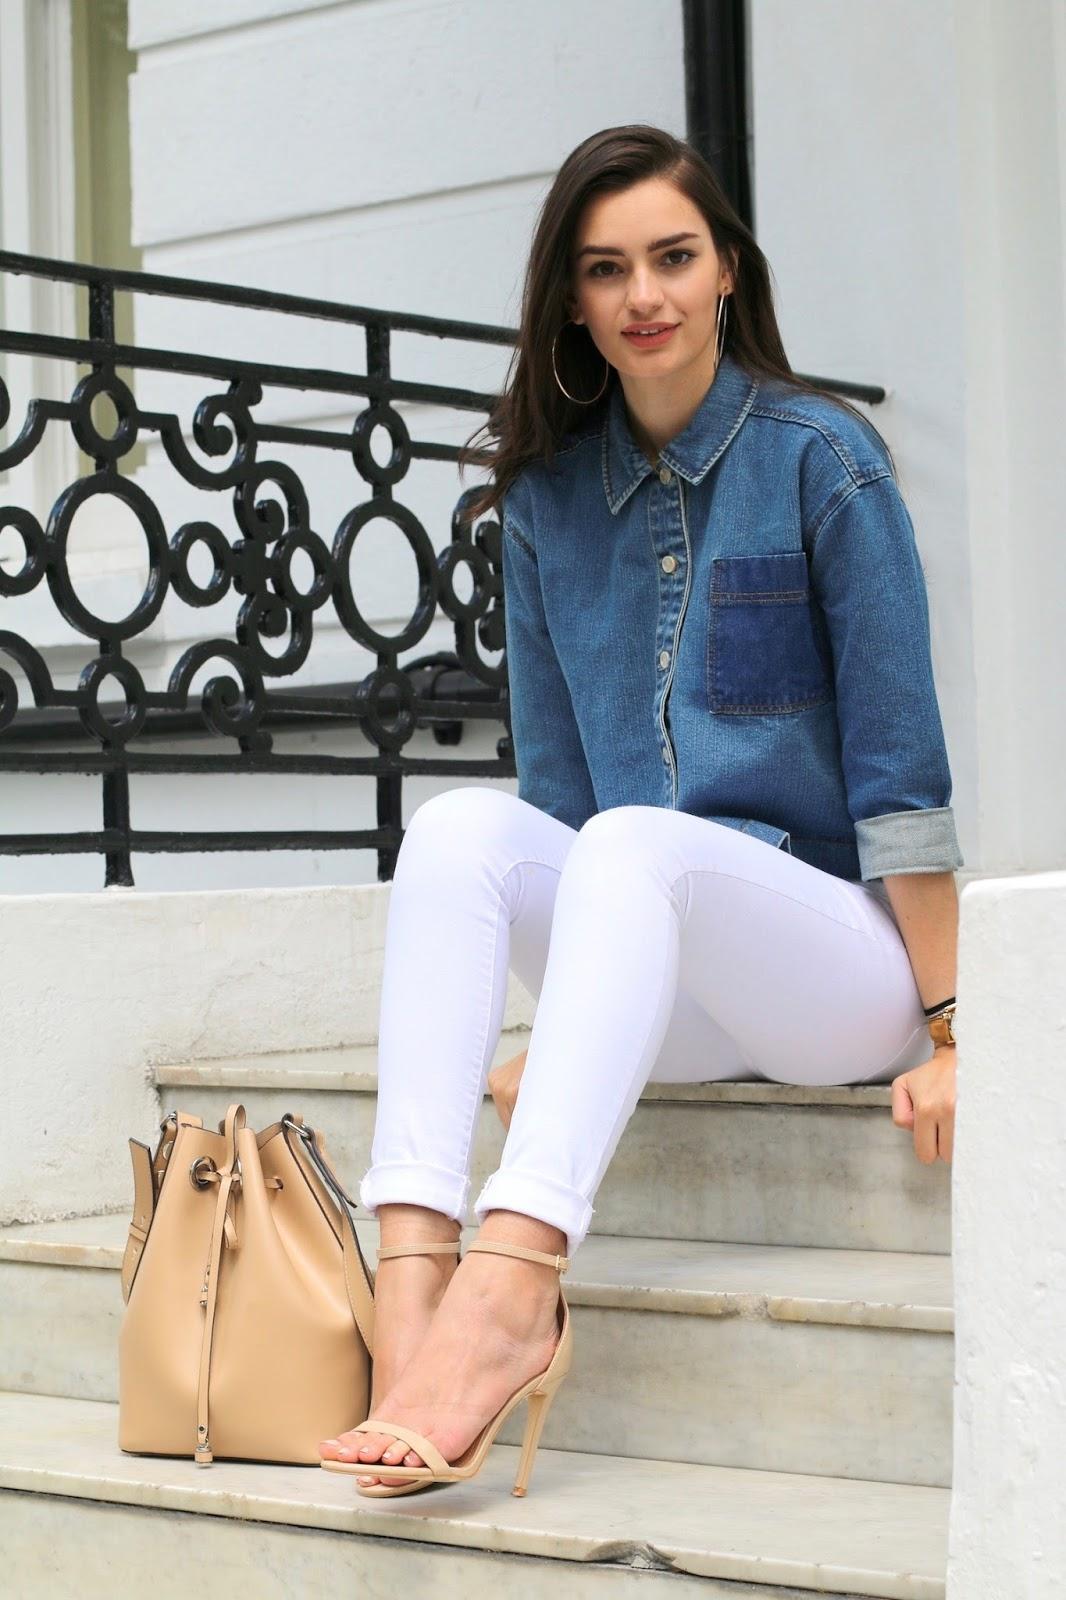 peexo fashion blogger